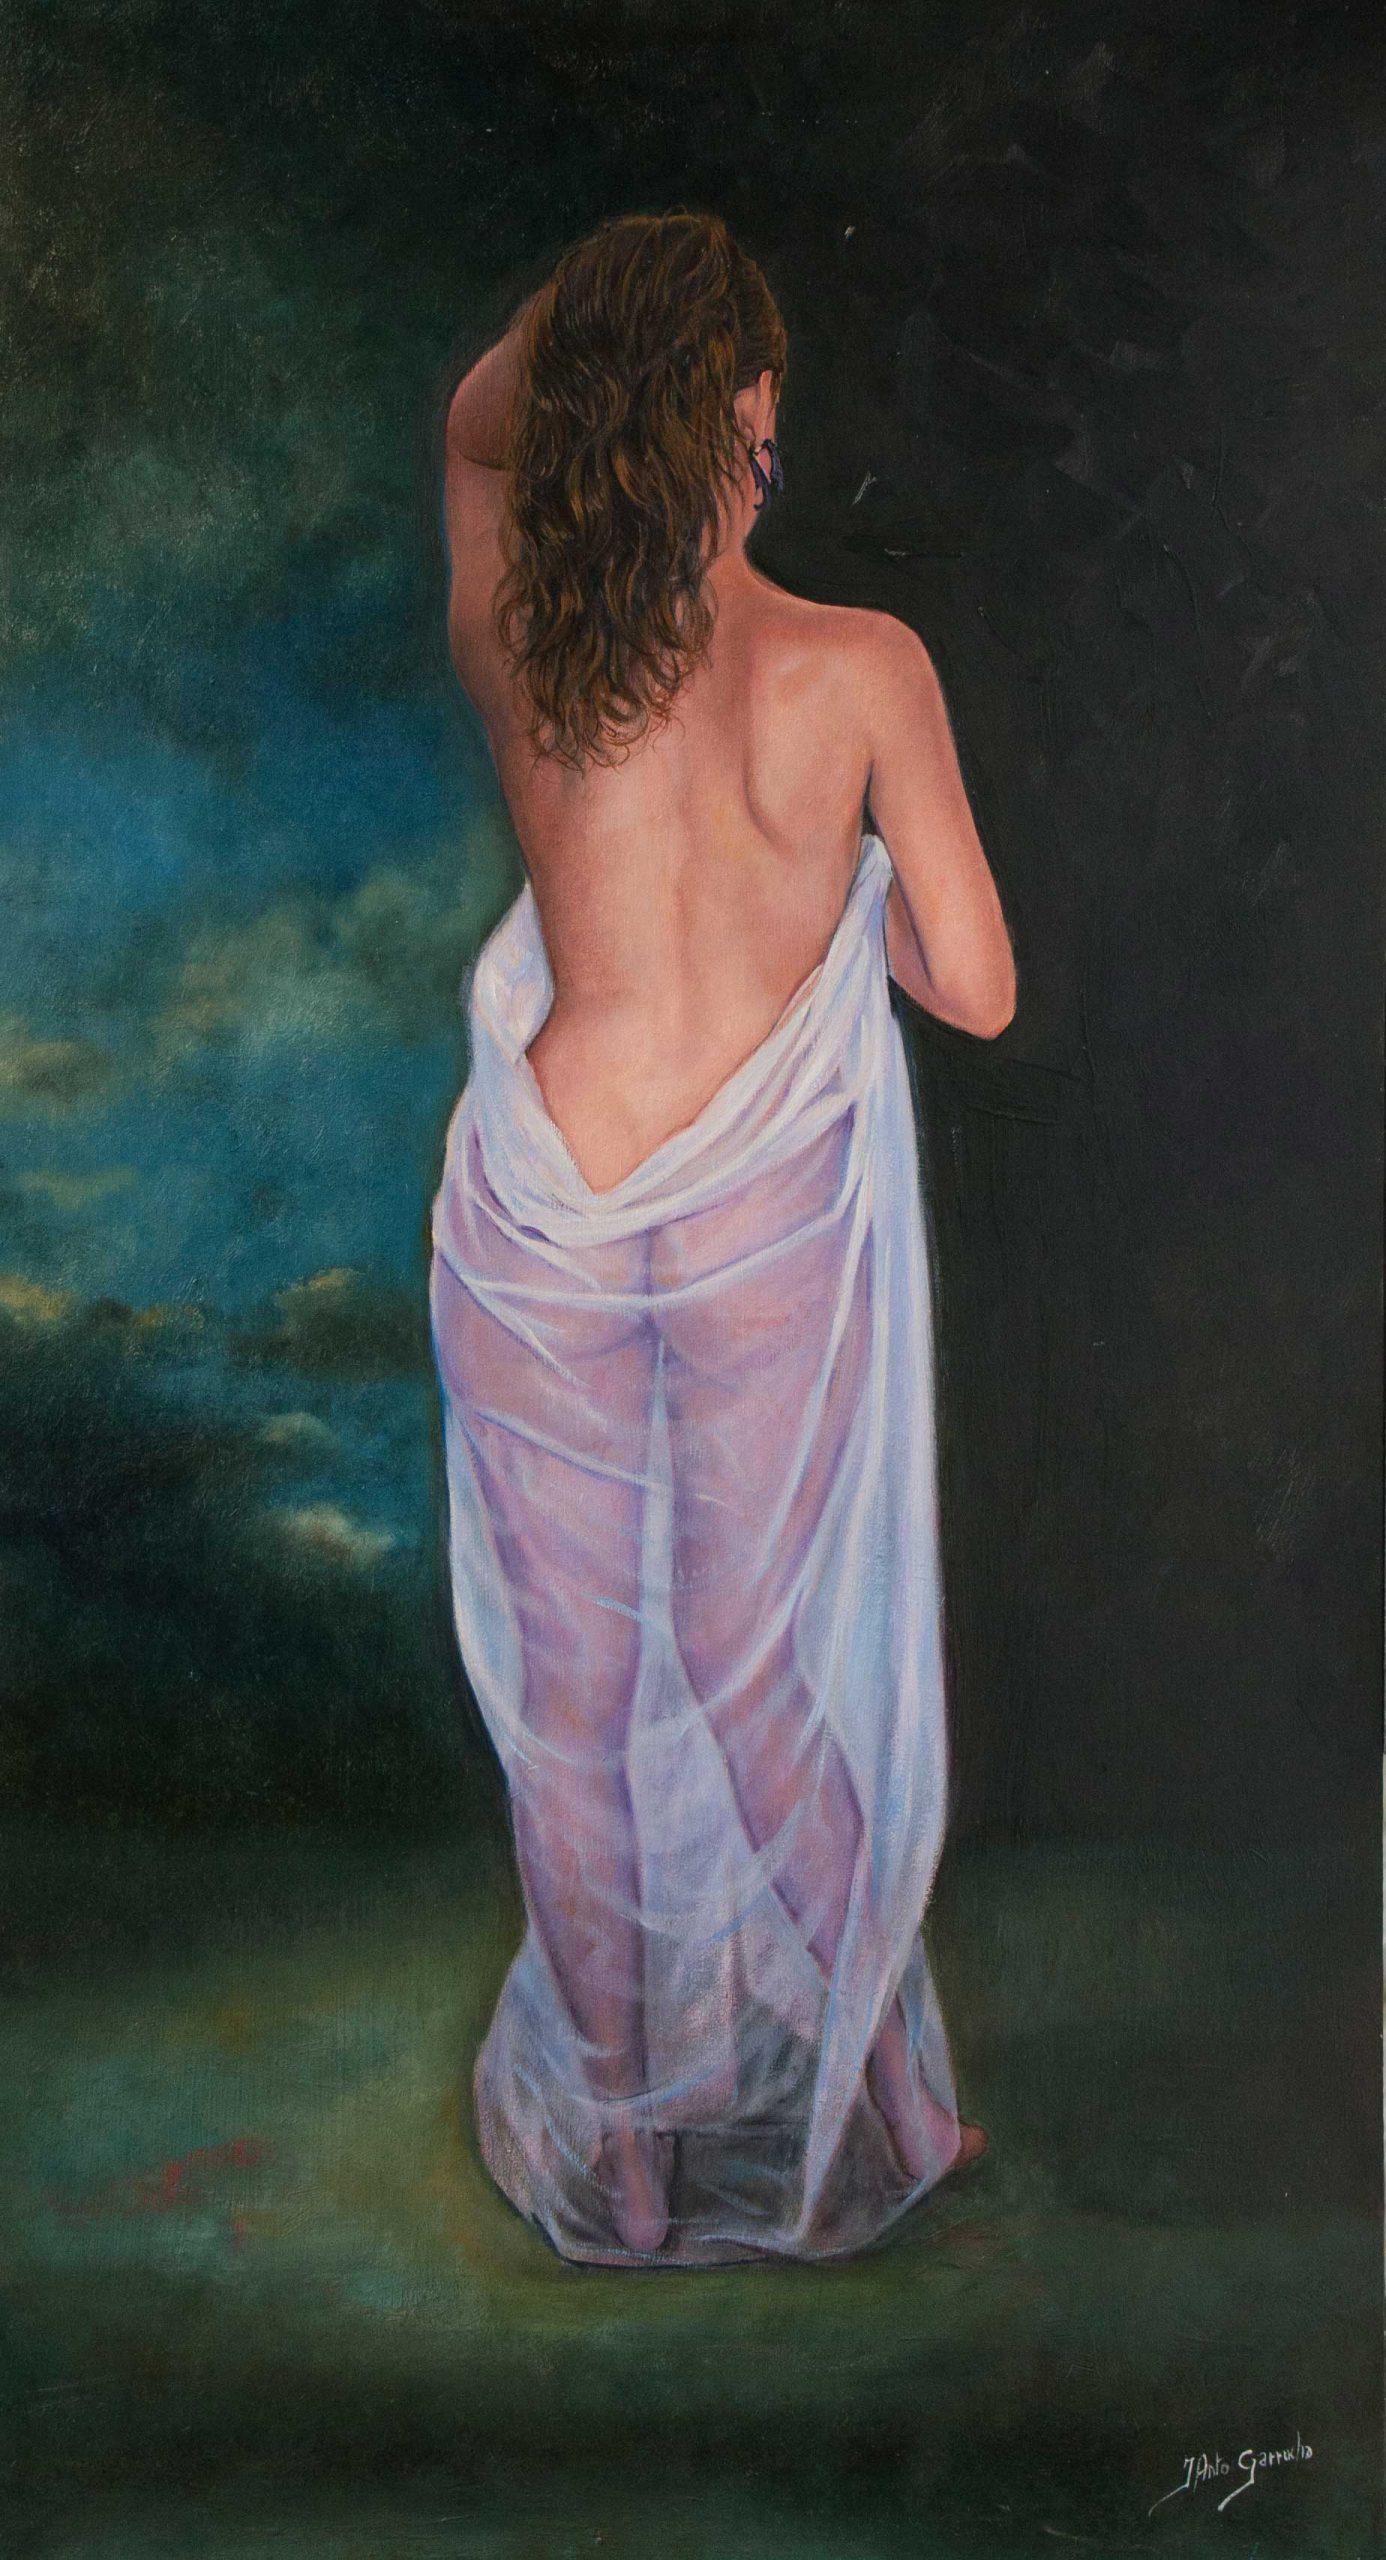 Desnudo con tul blanco